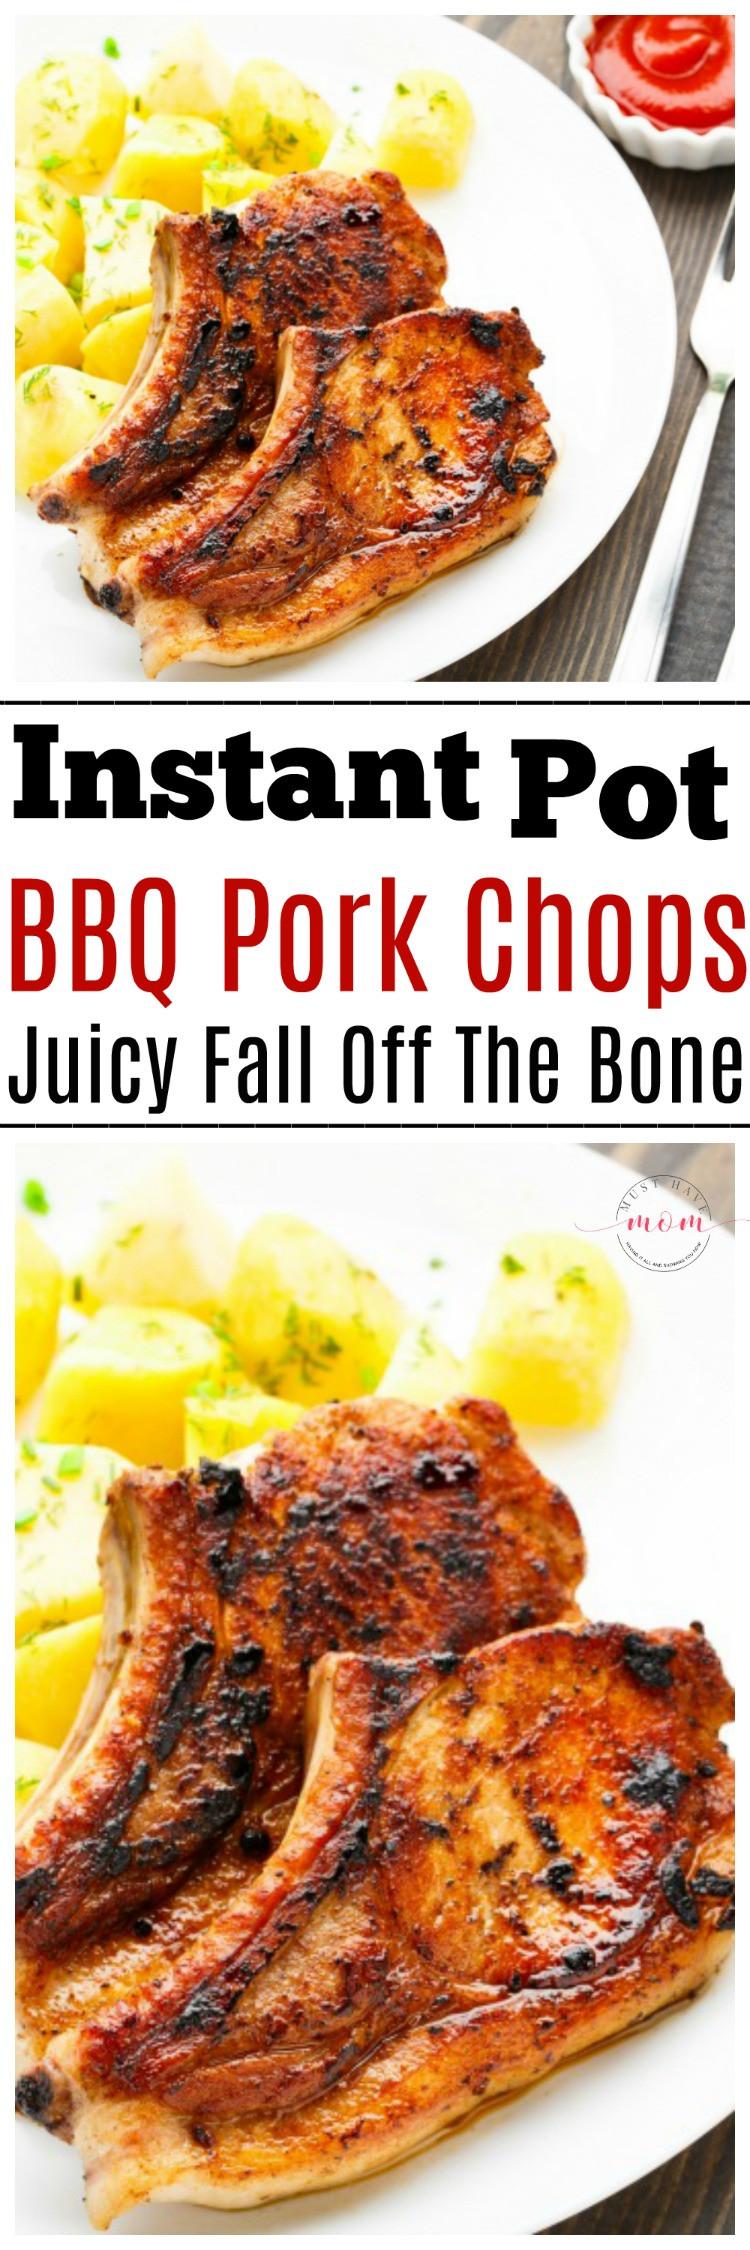 Frozen Pork Chops In Instant Pot  pressure cooker xl frozen pork chops